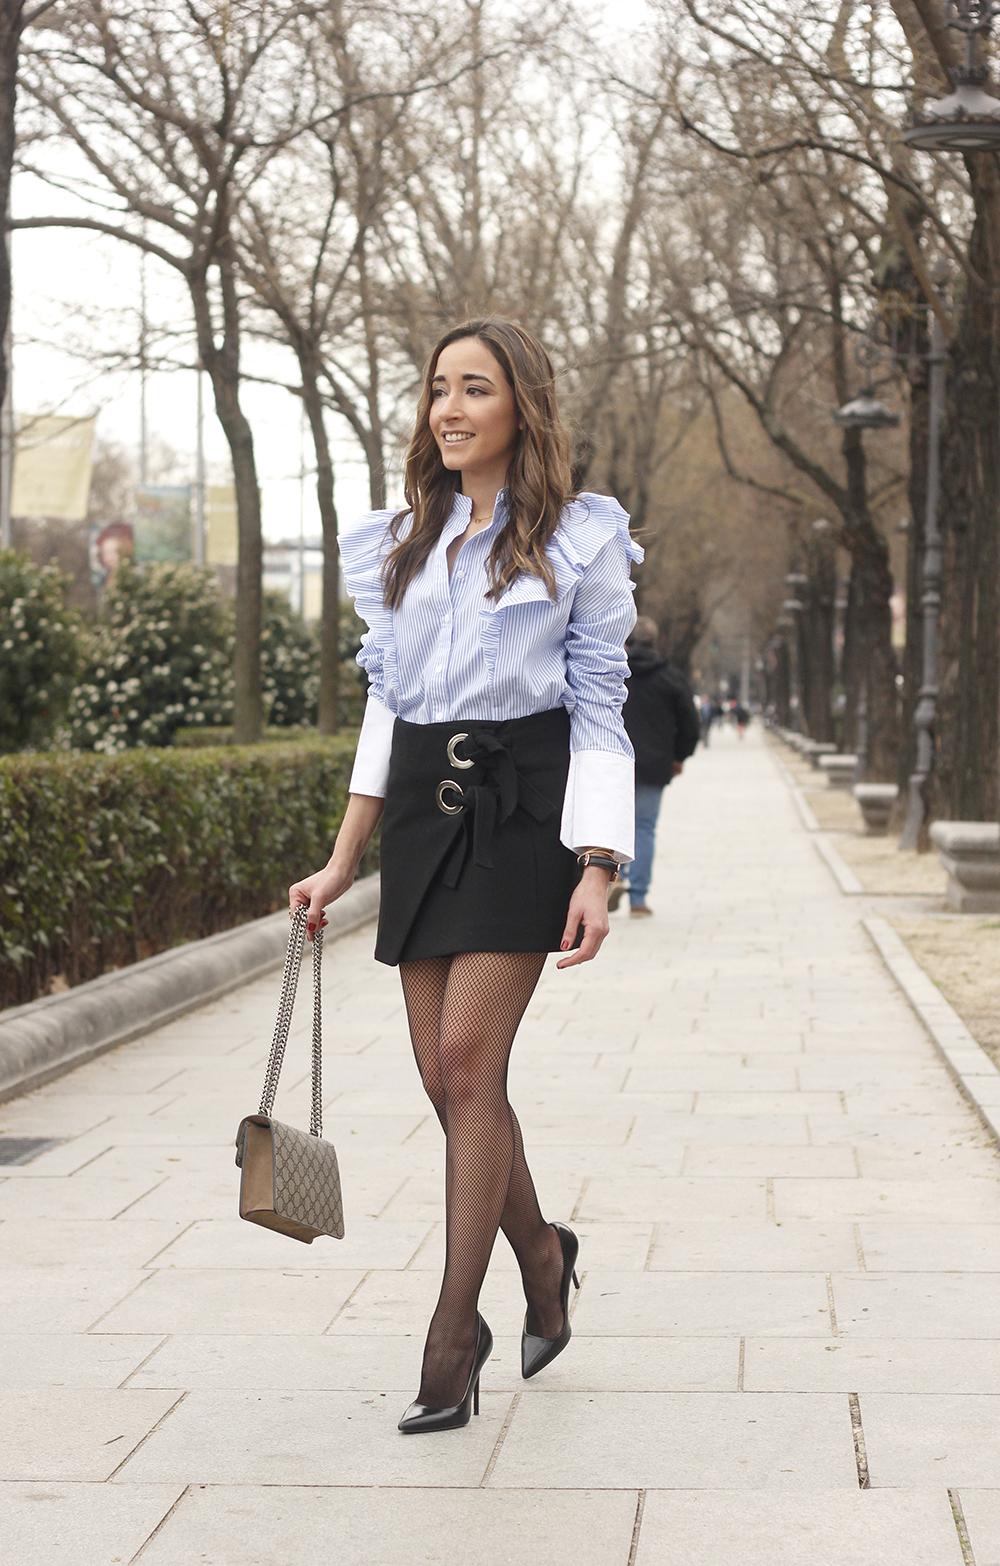 Ruffled striped shirt Fishnet tights black skirt heels gucci bag style fashion outfit 04